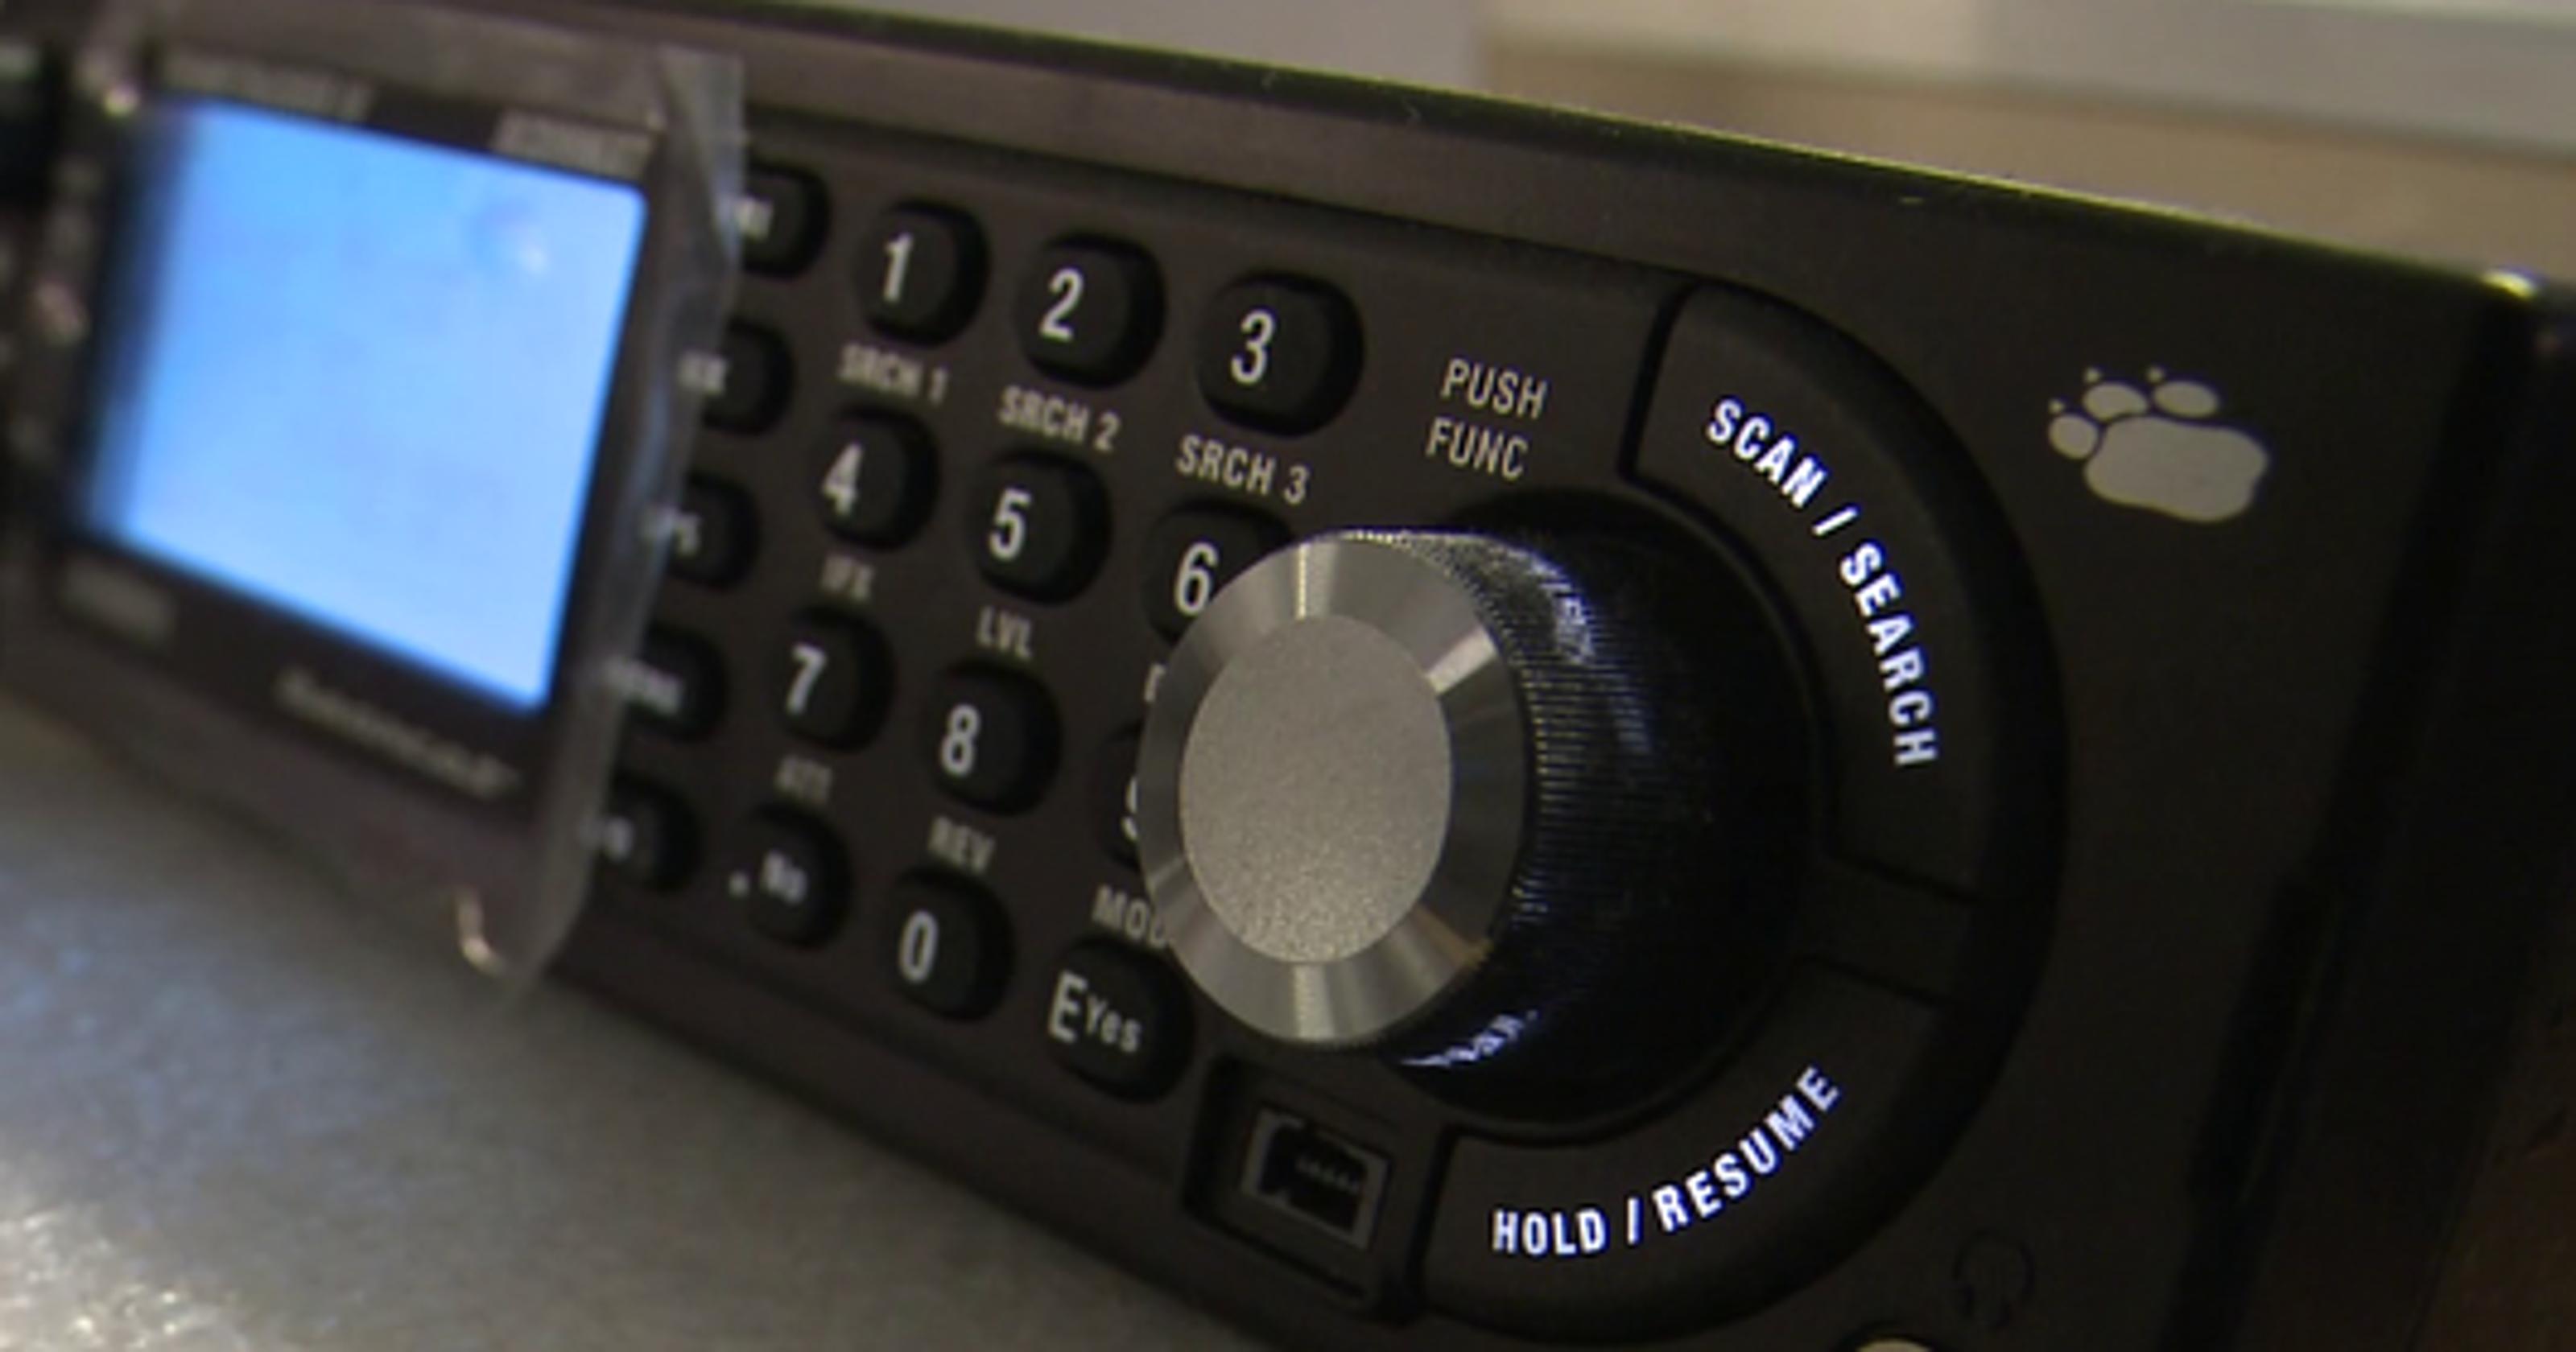 Nashville police to encrypt radio communications, block scanners